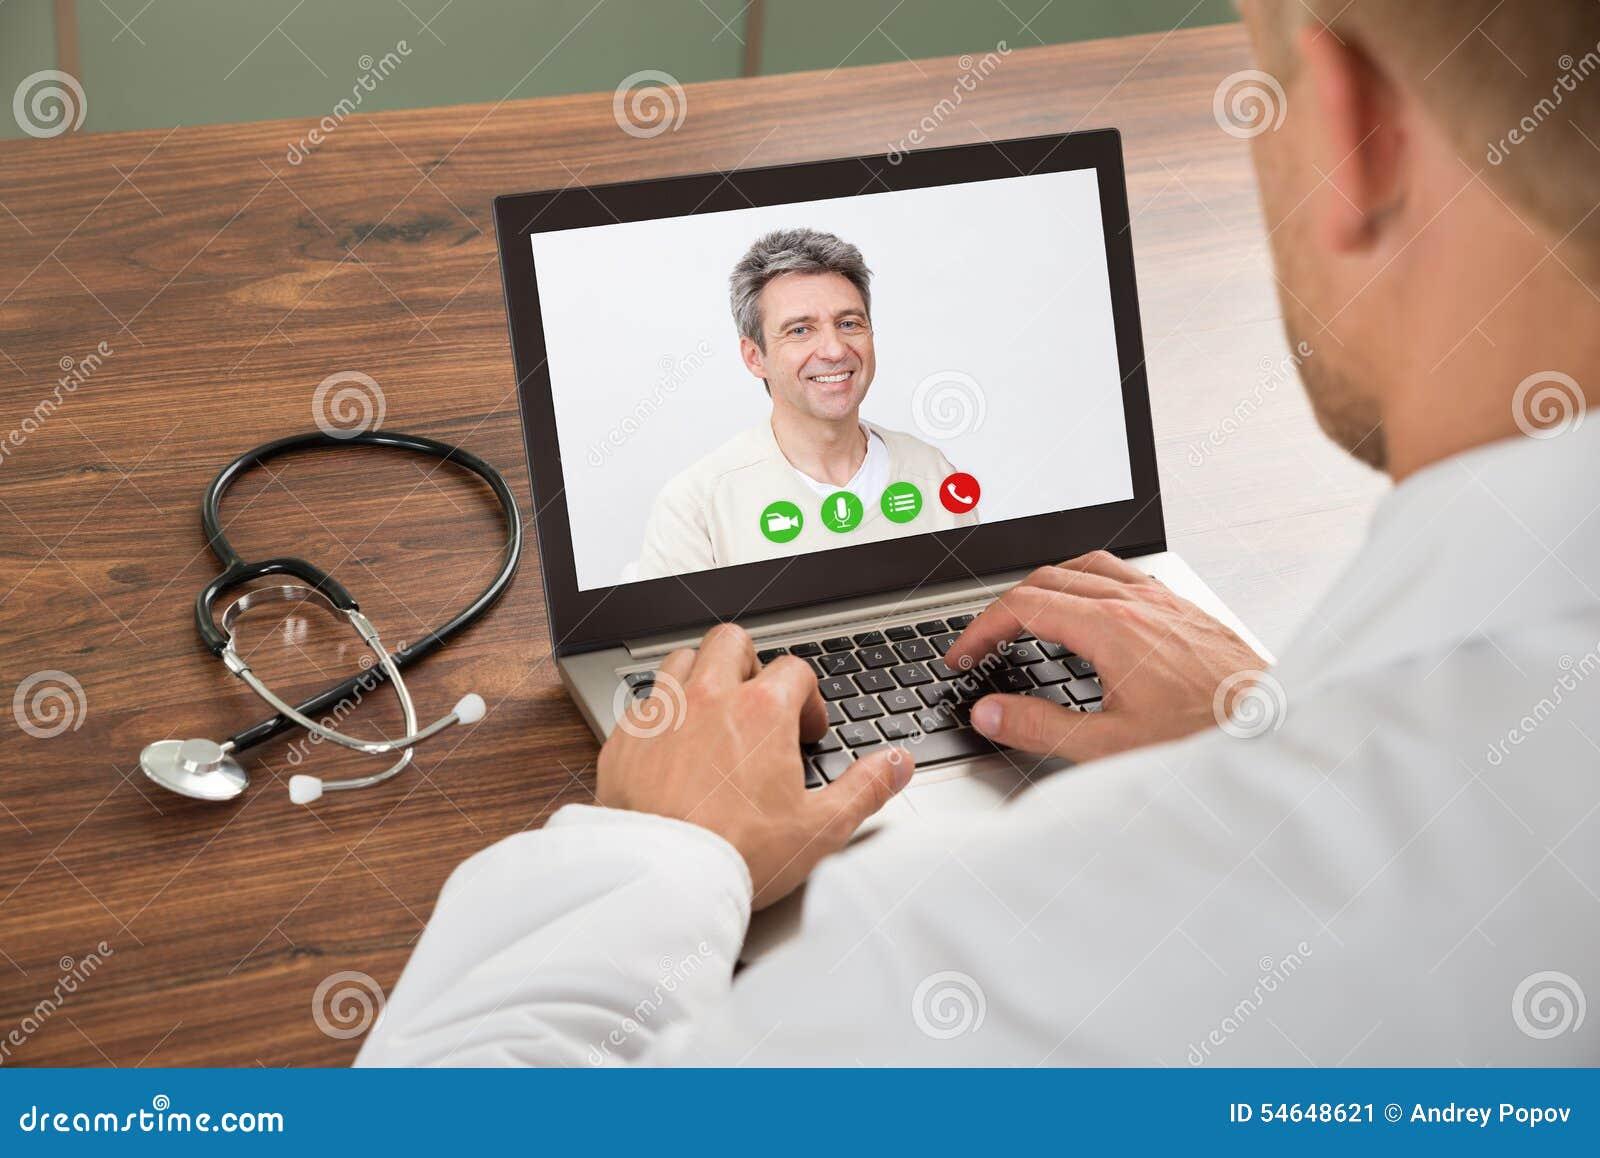 Men video chat